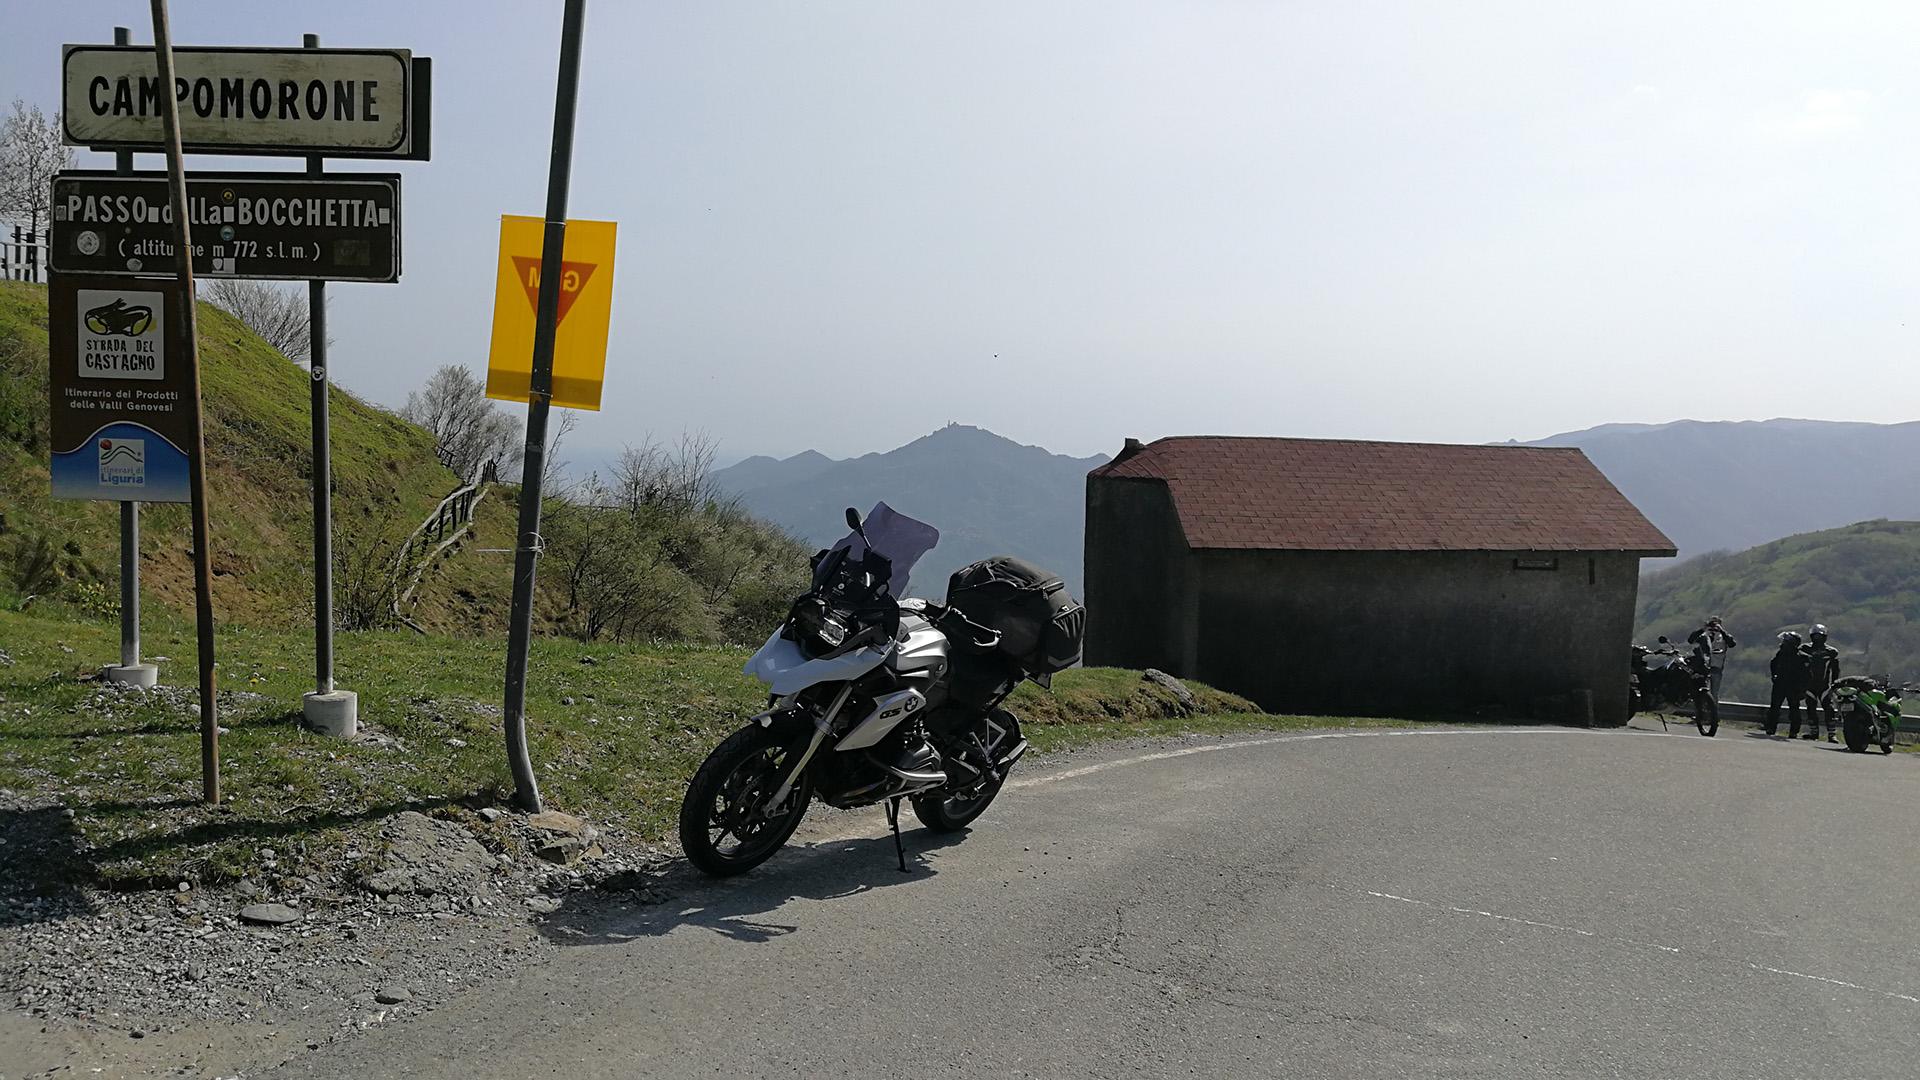 0772 - I - Passo della Bocchetta